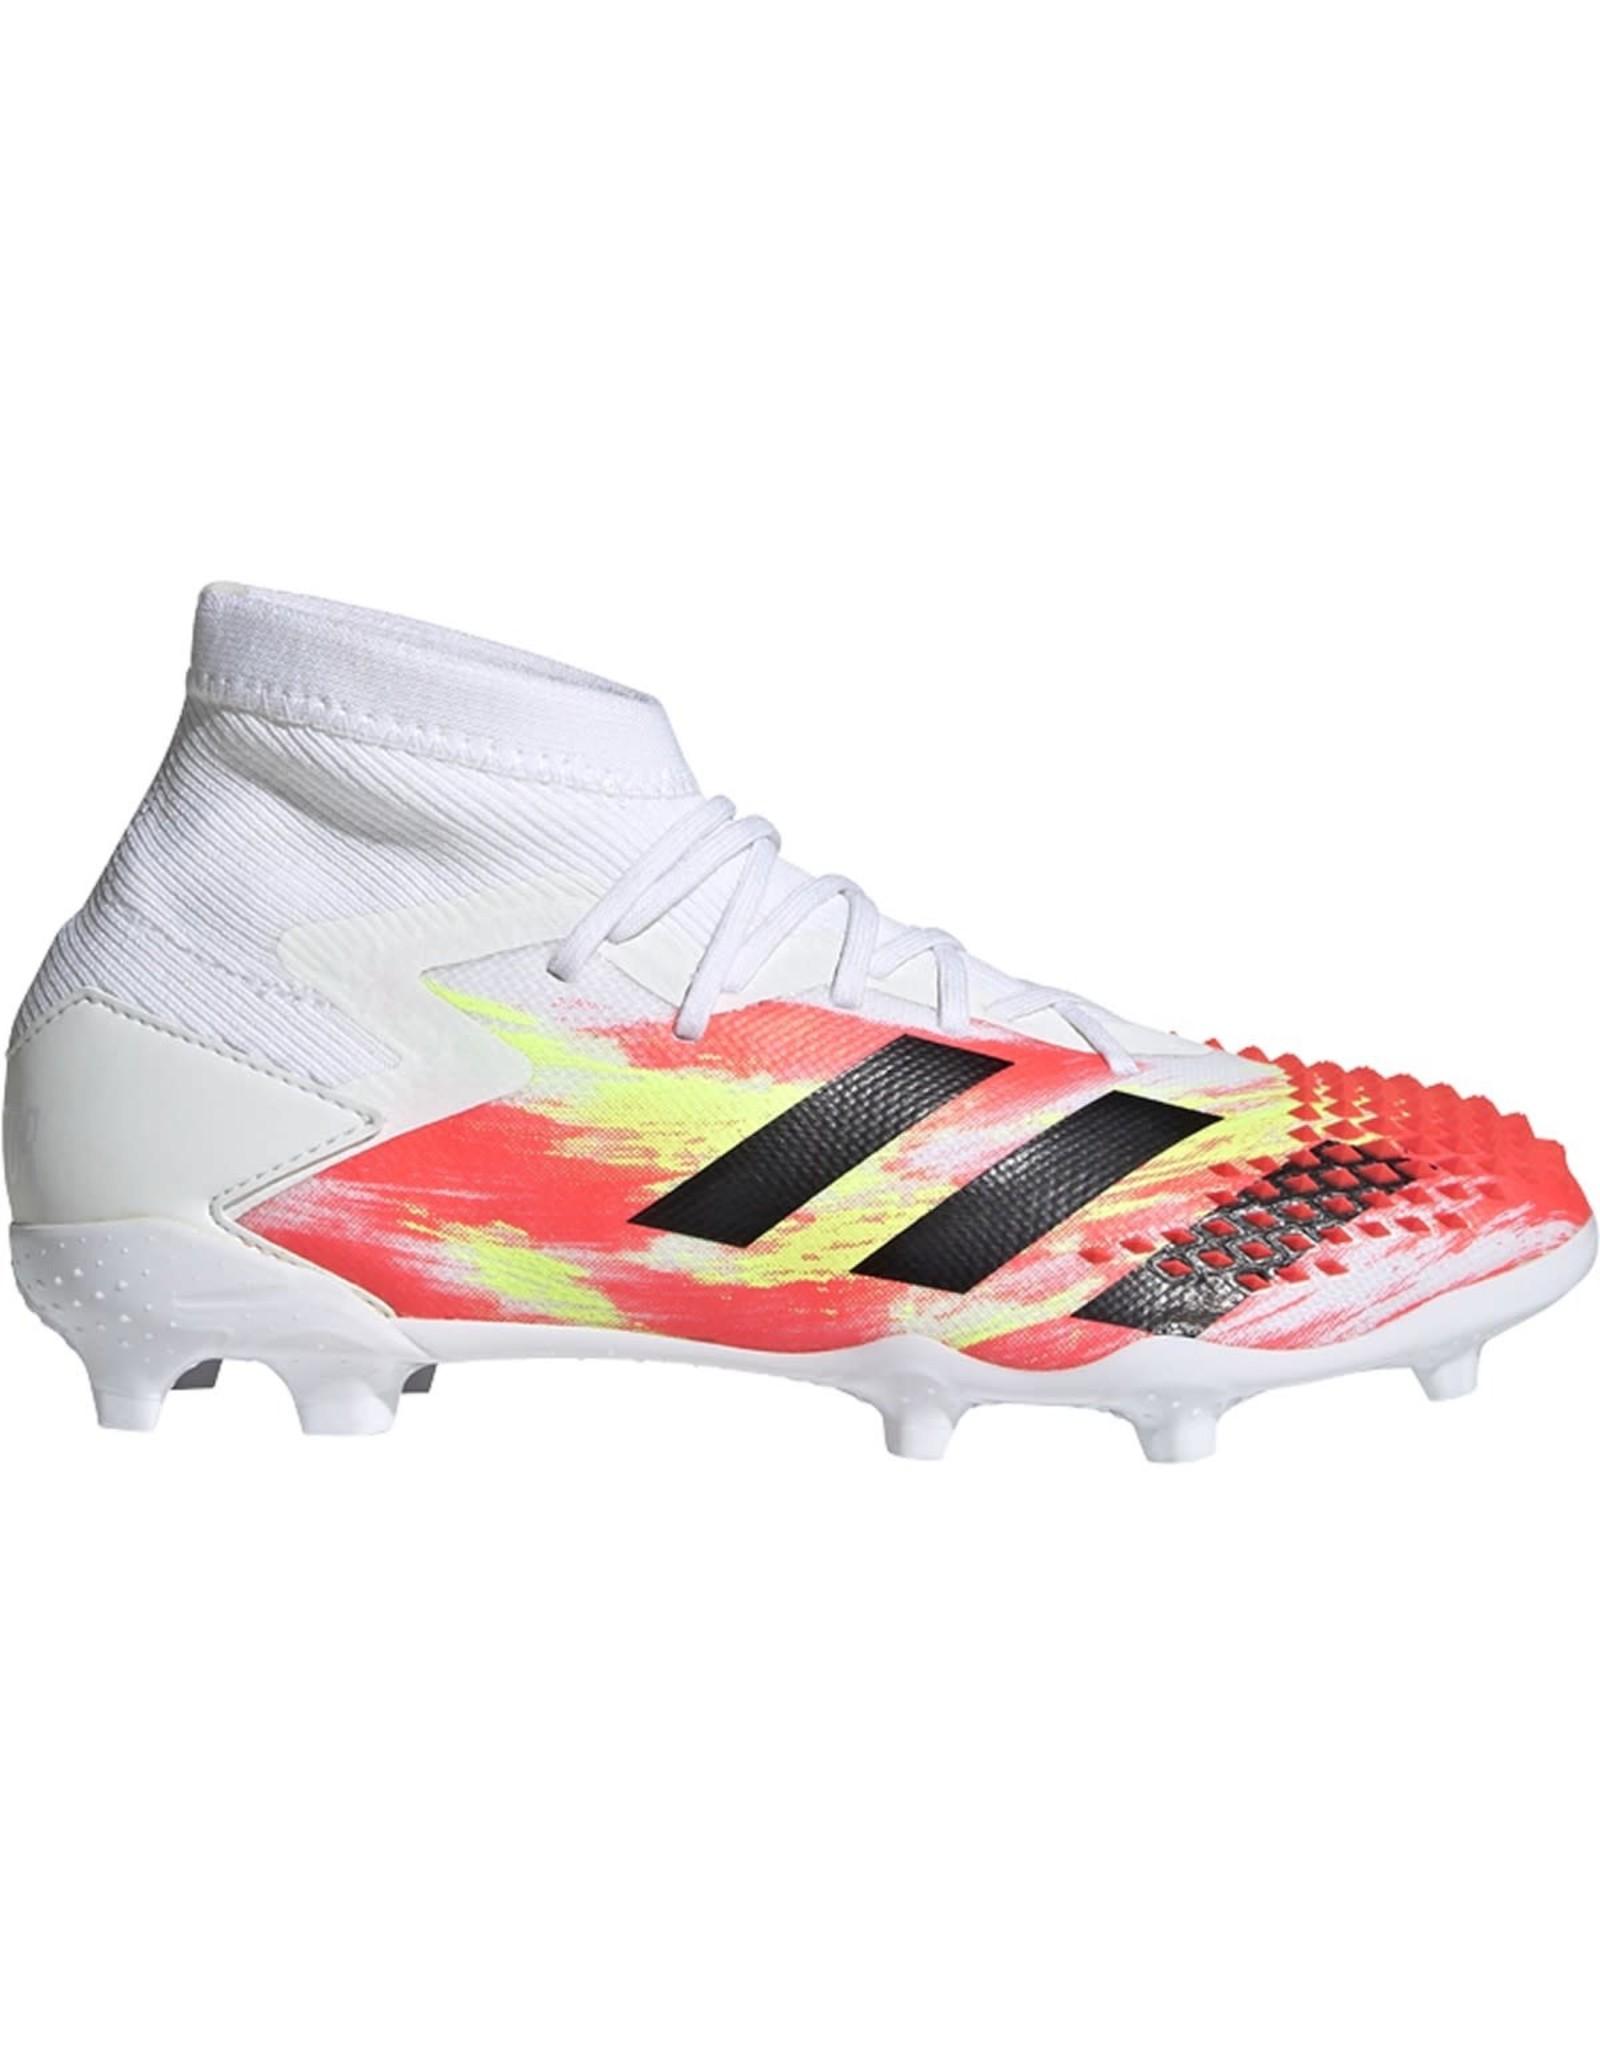 Adidas PREDATOR MUTATOR 20.1 FG J (FTWWHT/CBLACK/POP) 5.5